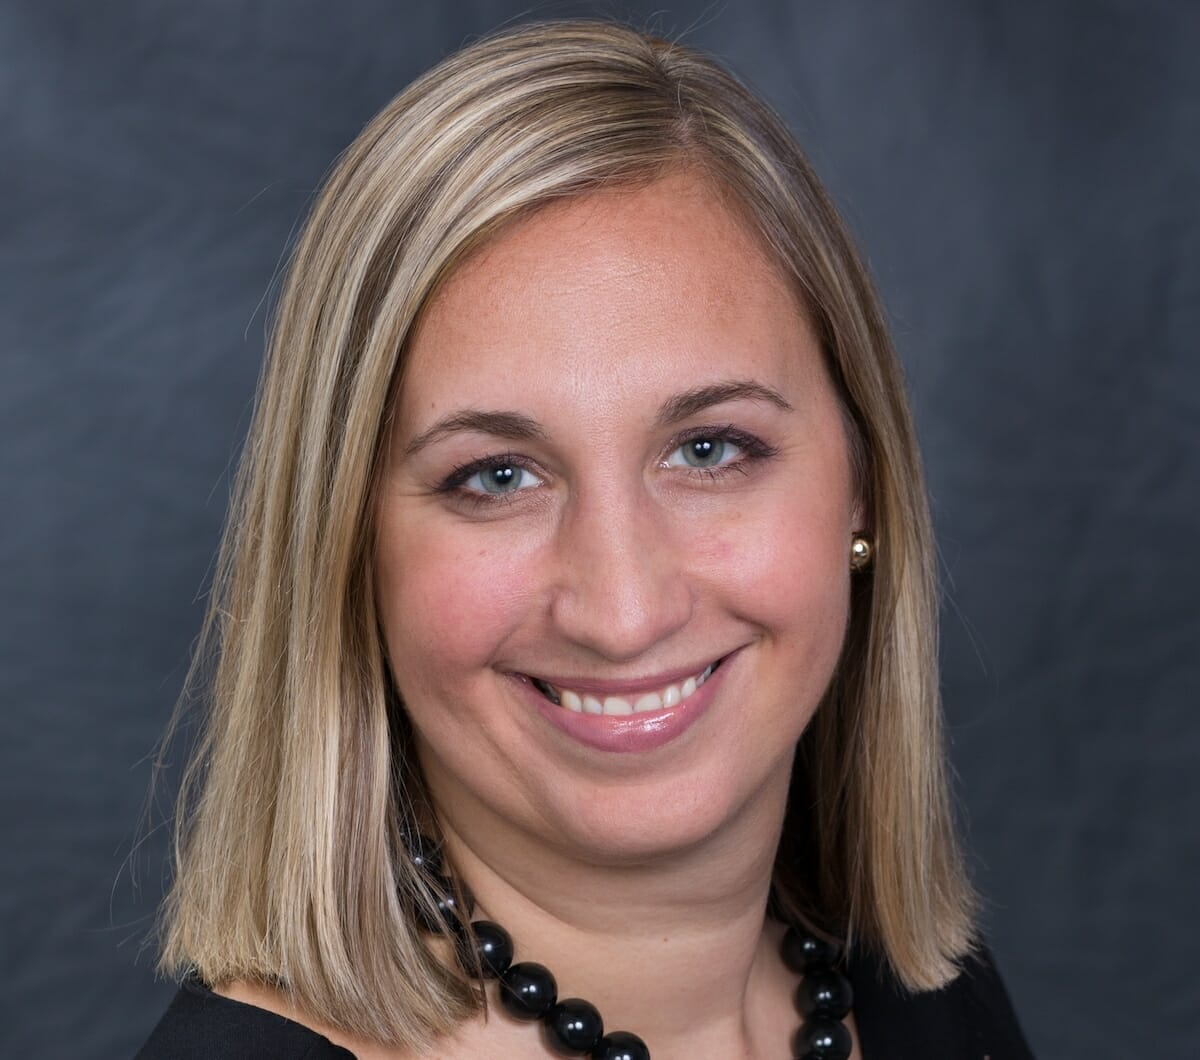 GCI Health names Kristin Cahill its next global CEO